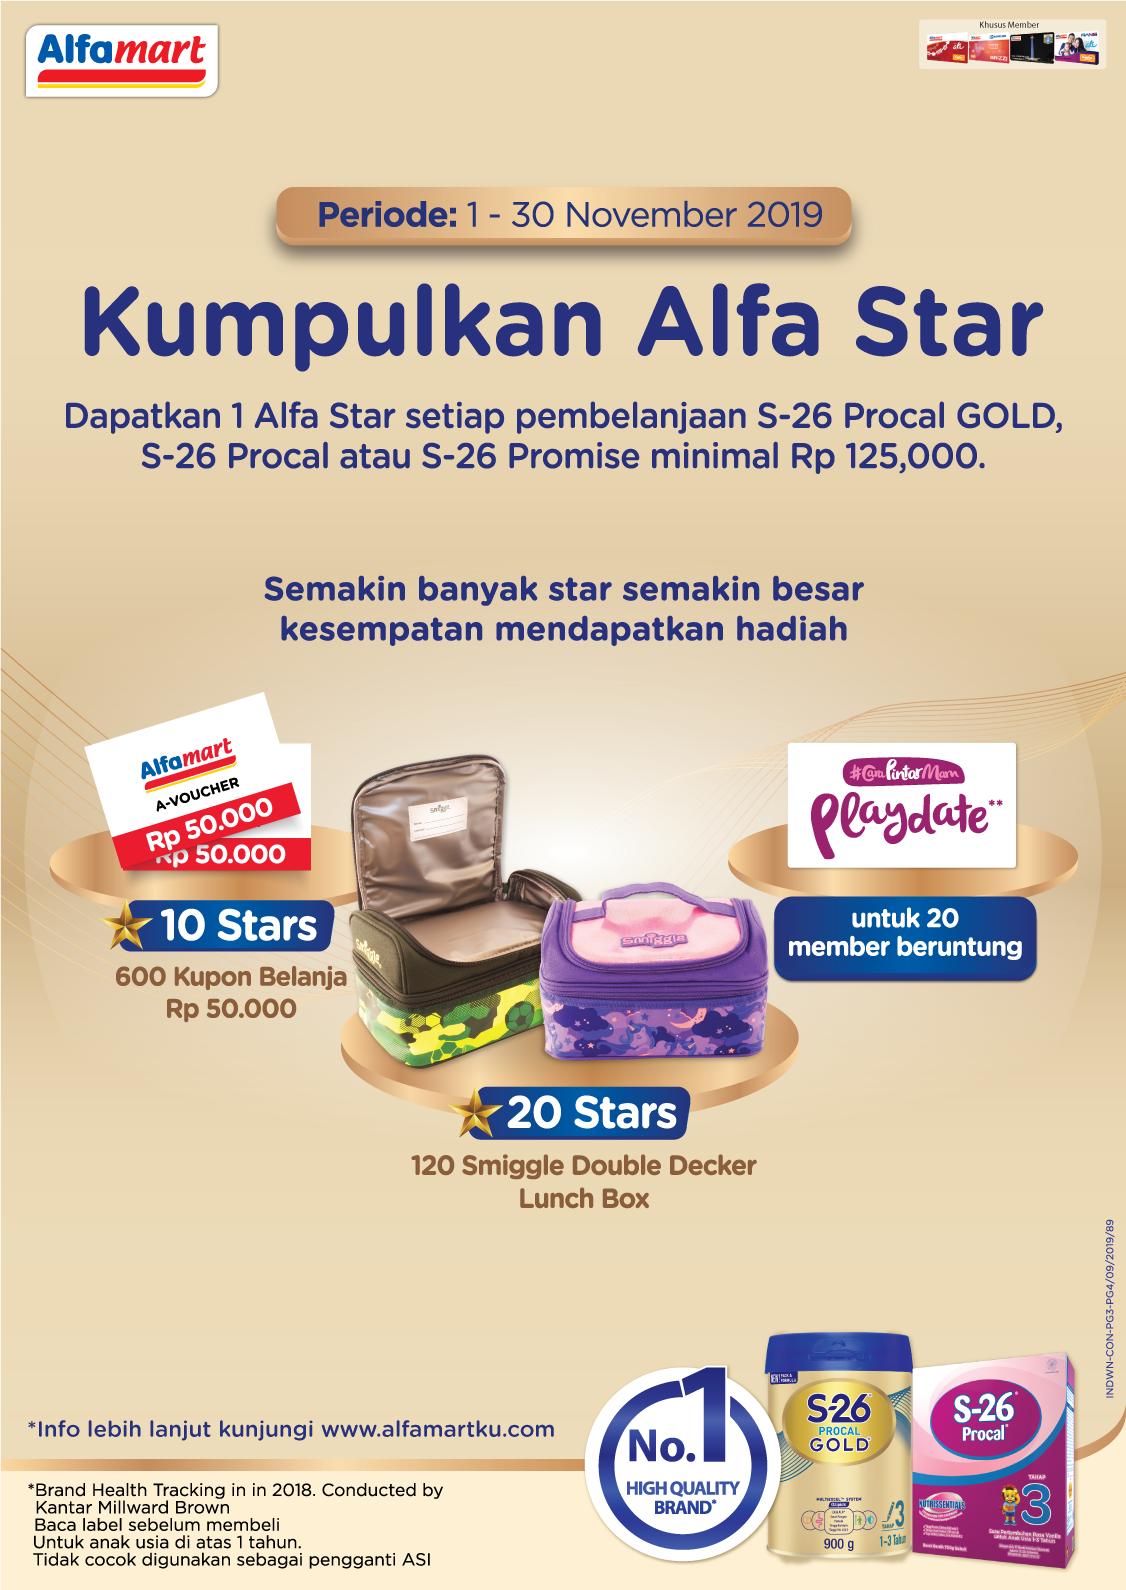 Kumpulkan Alfastar di Program S- 26 Procal Gold